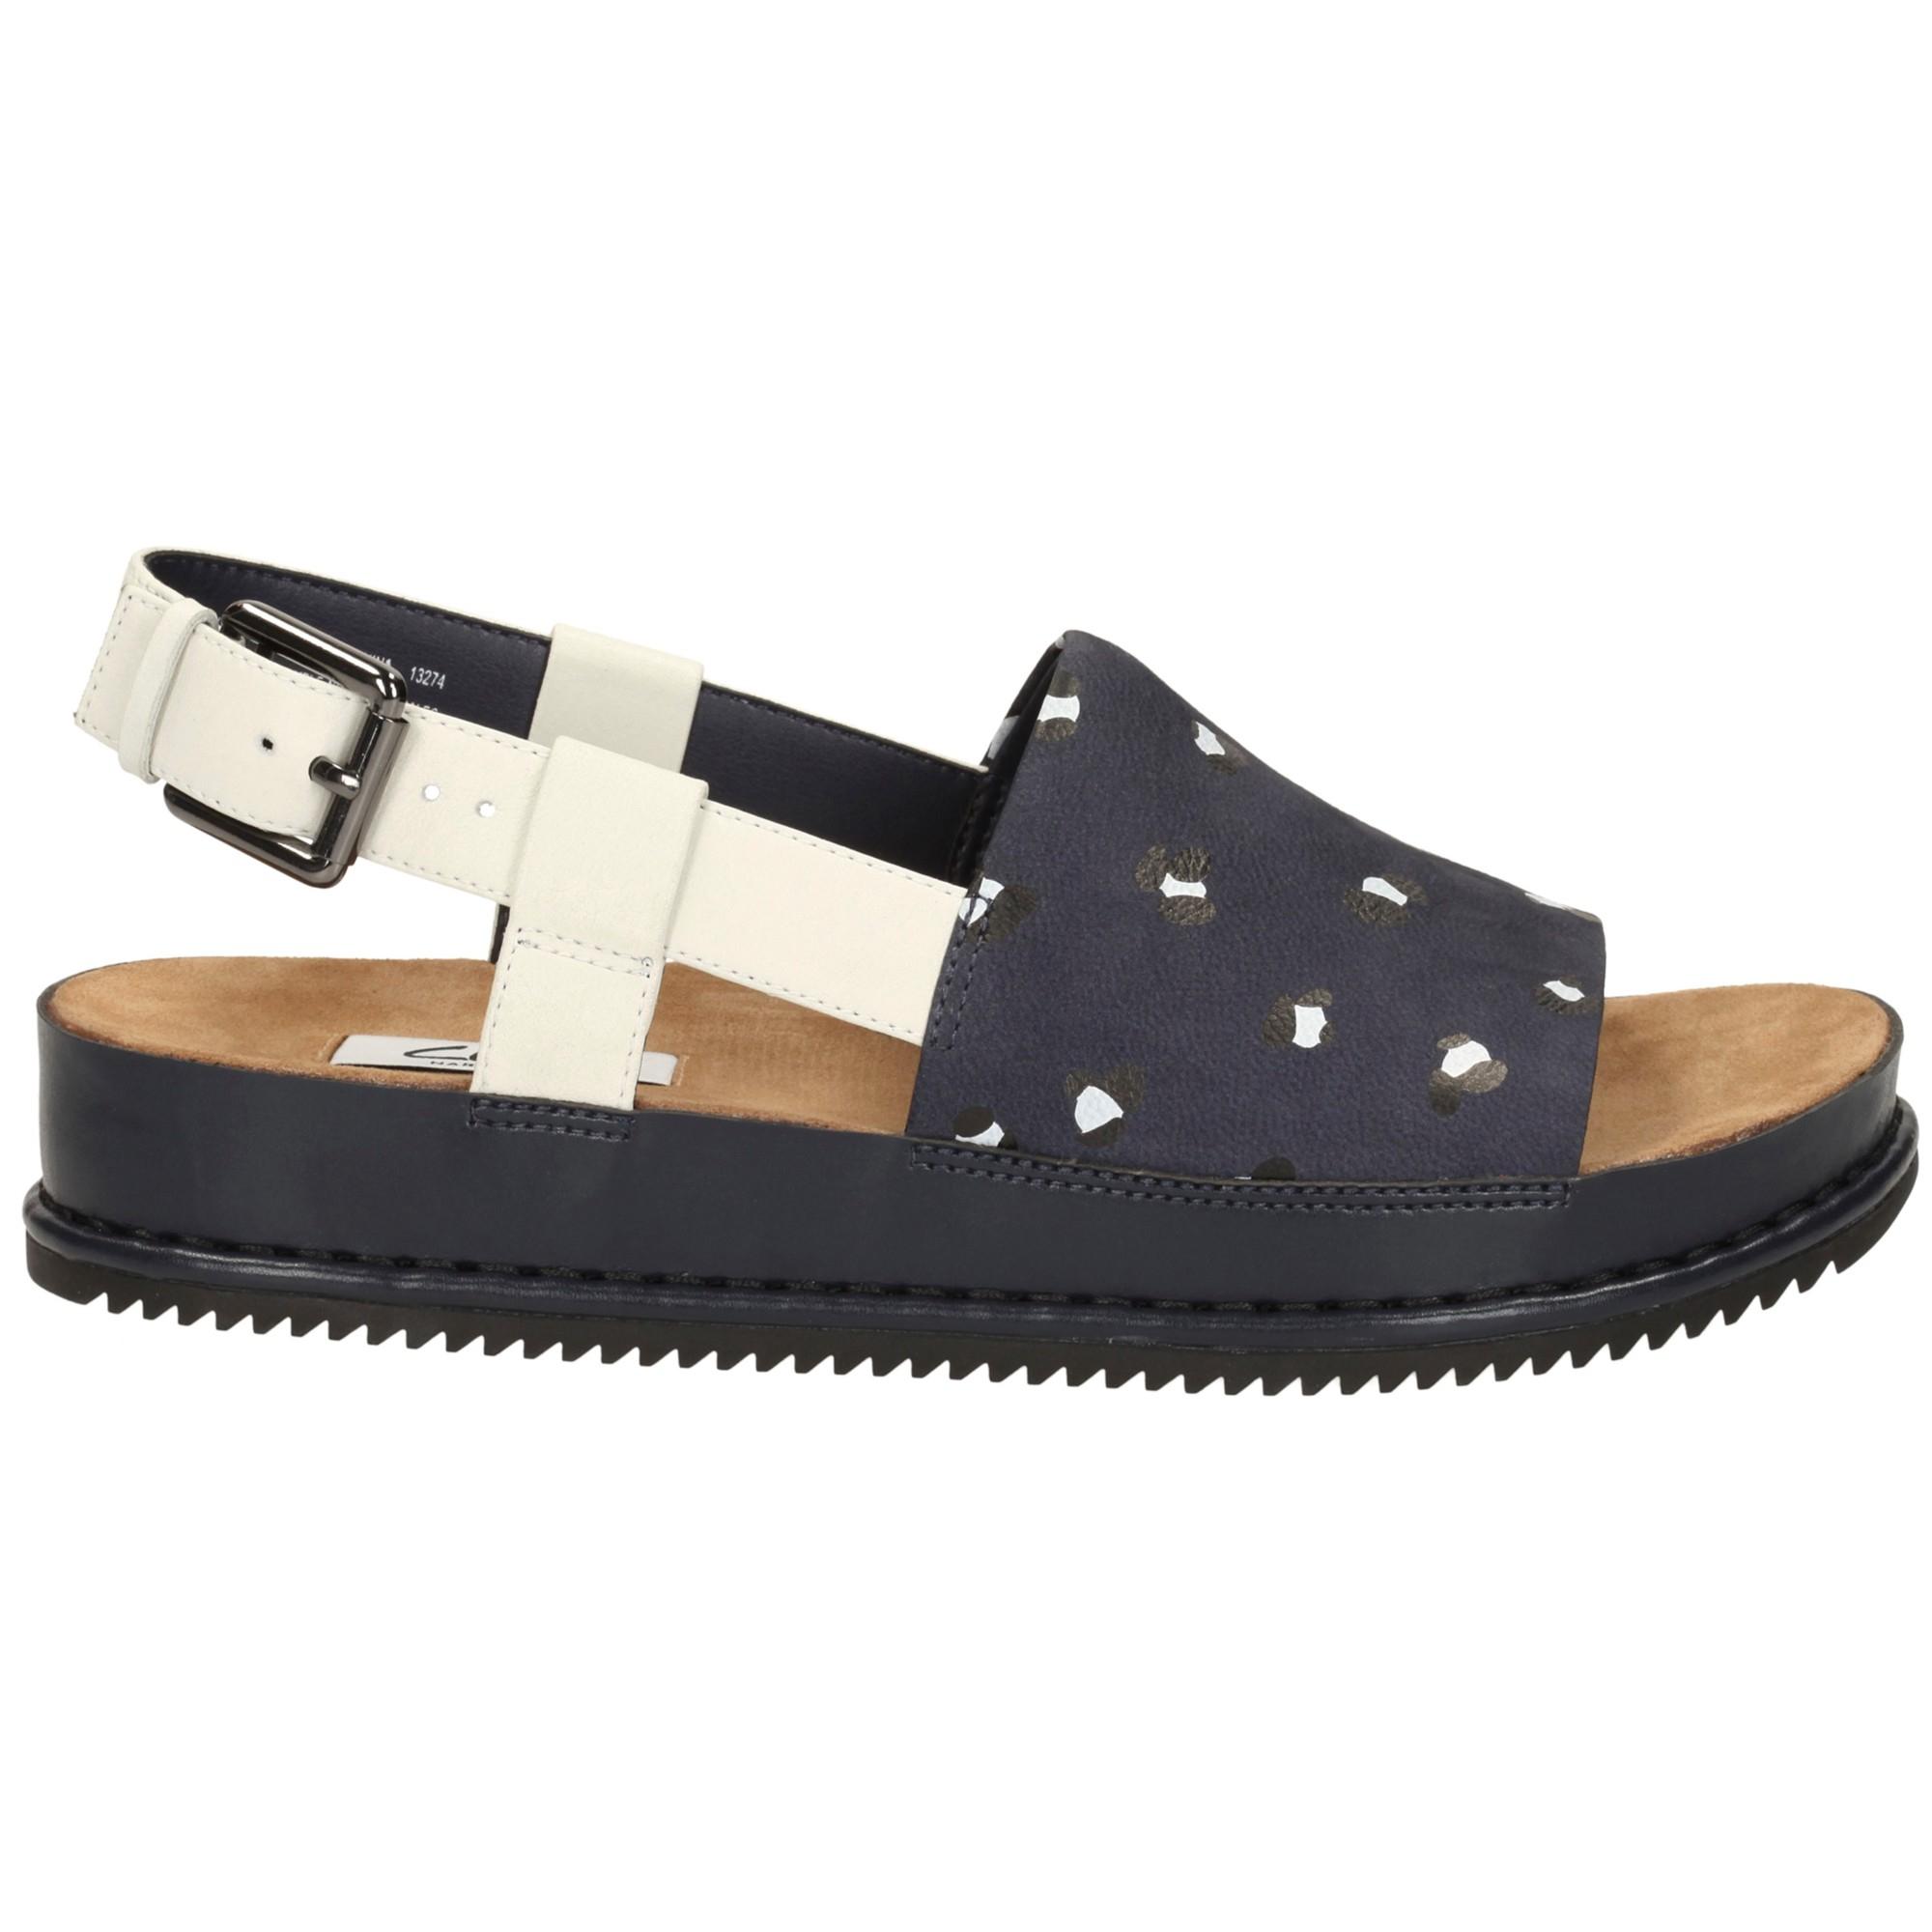 c52415df6a90 Clarks Alderlake May Flatform Sandals - Lyst